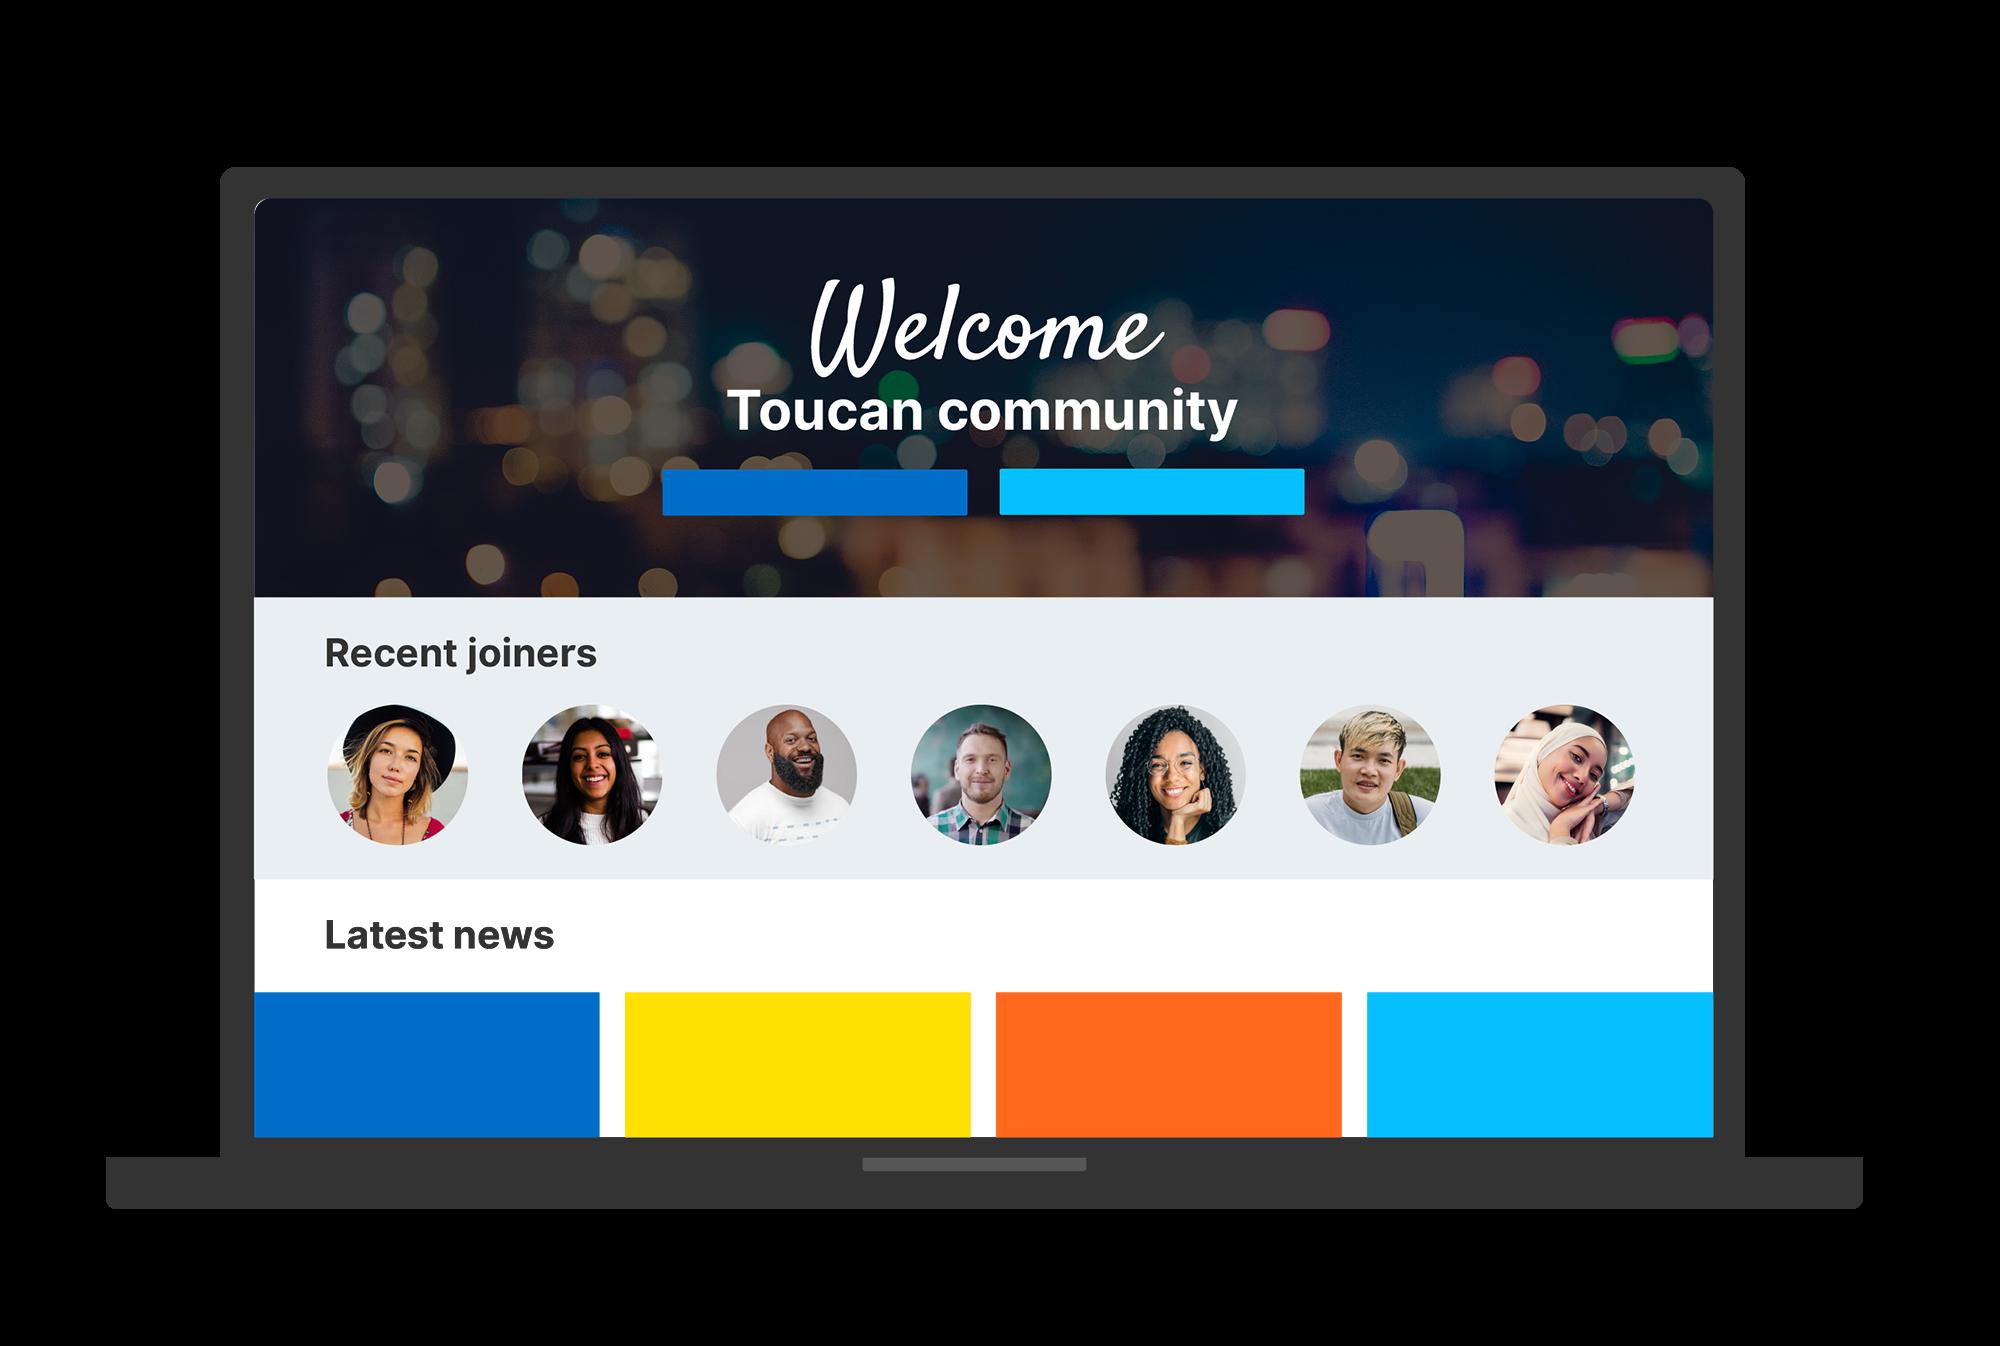 ToucanTech Software - Get closer to your community